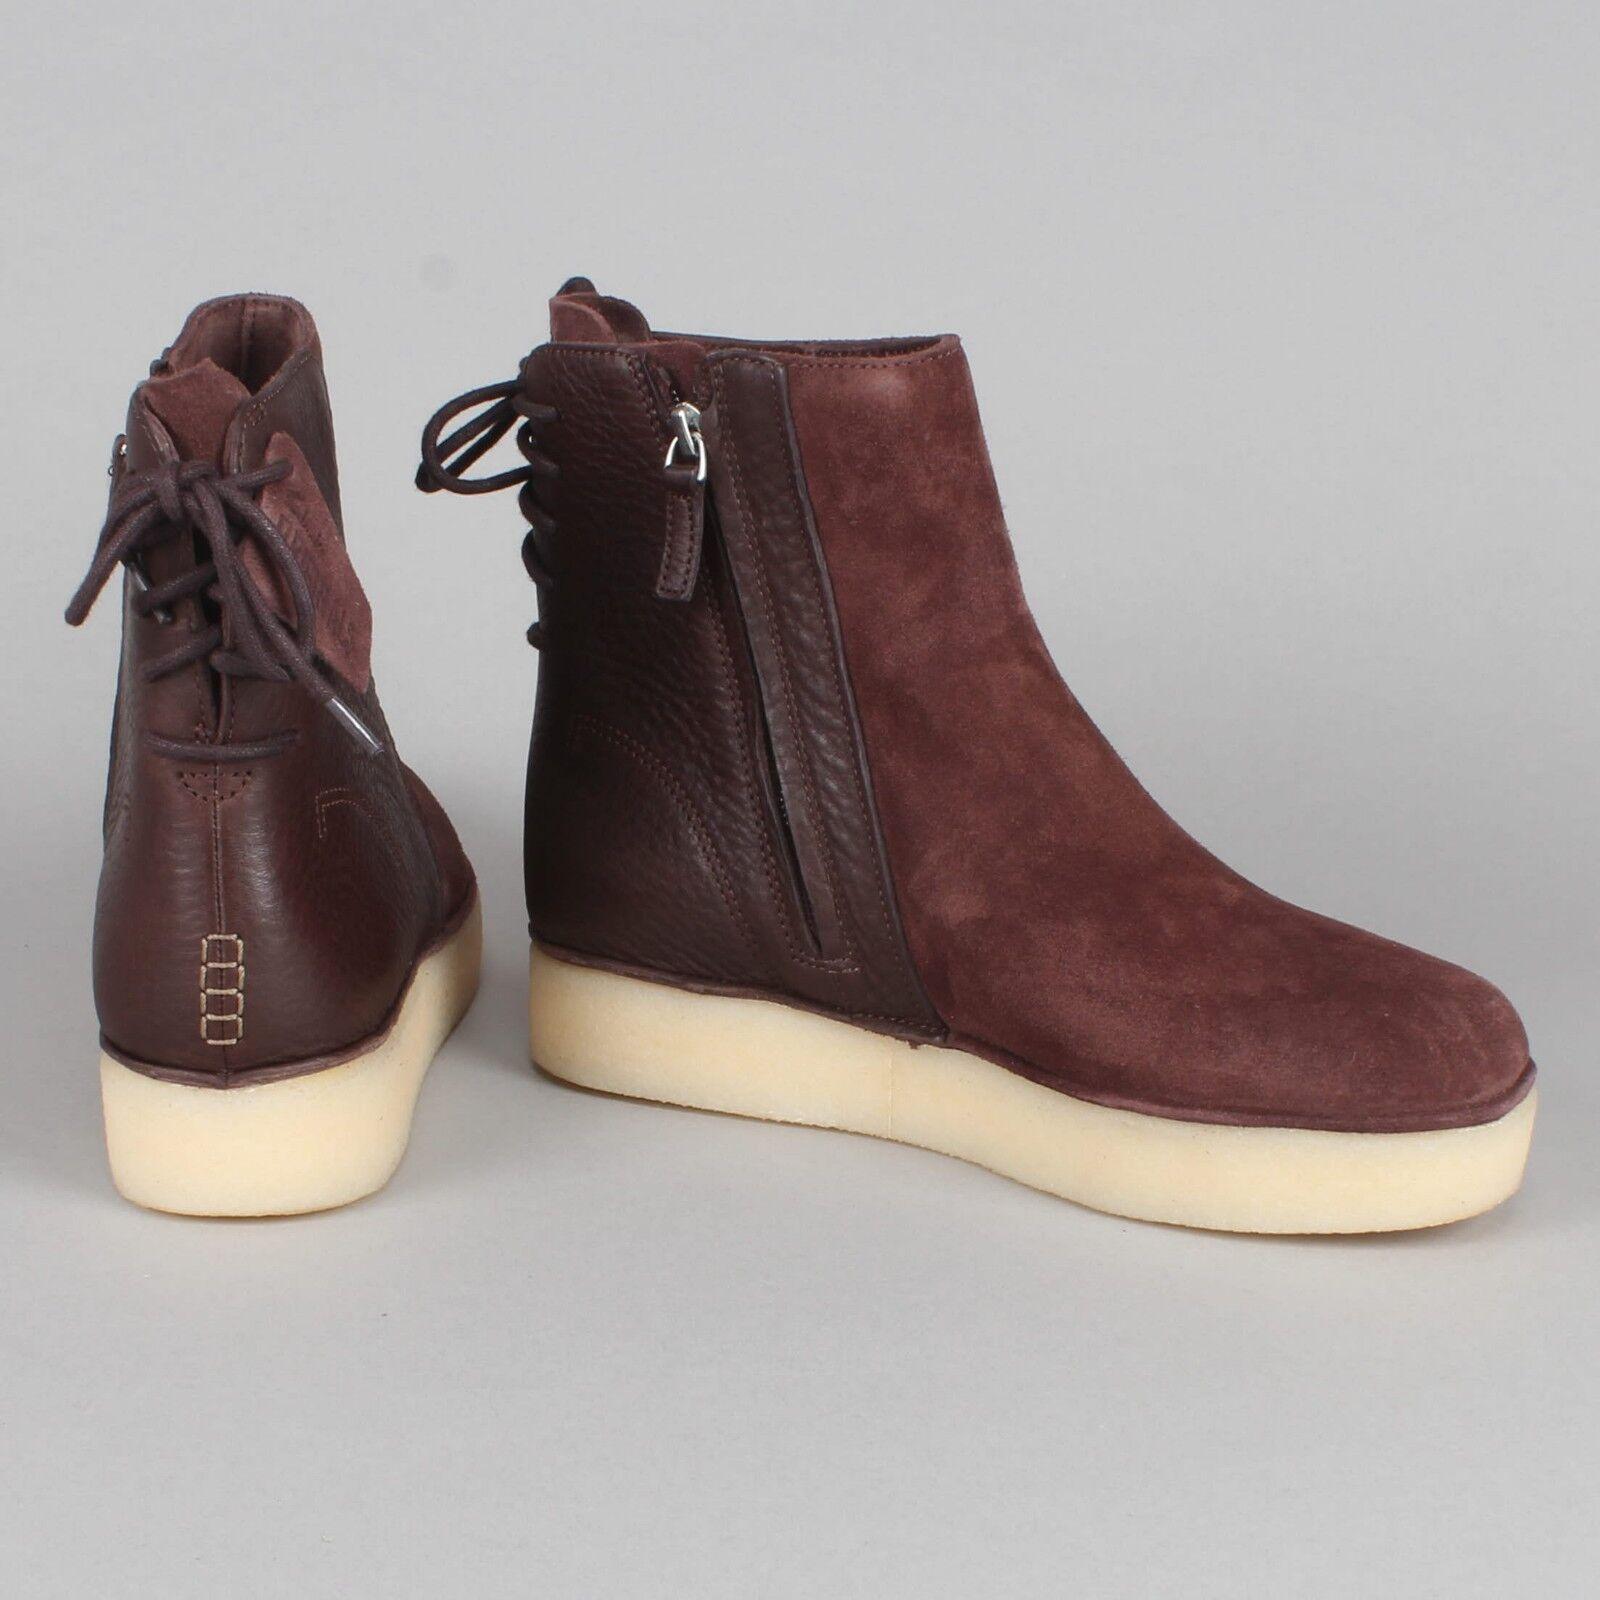 Clarks Originals Timberly Grace Khaki/Braun Combi Suede Ankle Stiefel Größe 7/41